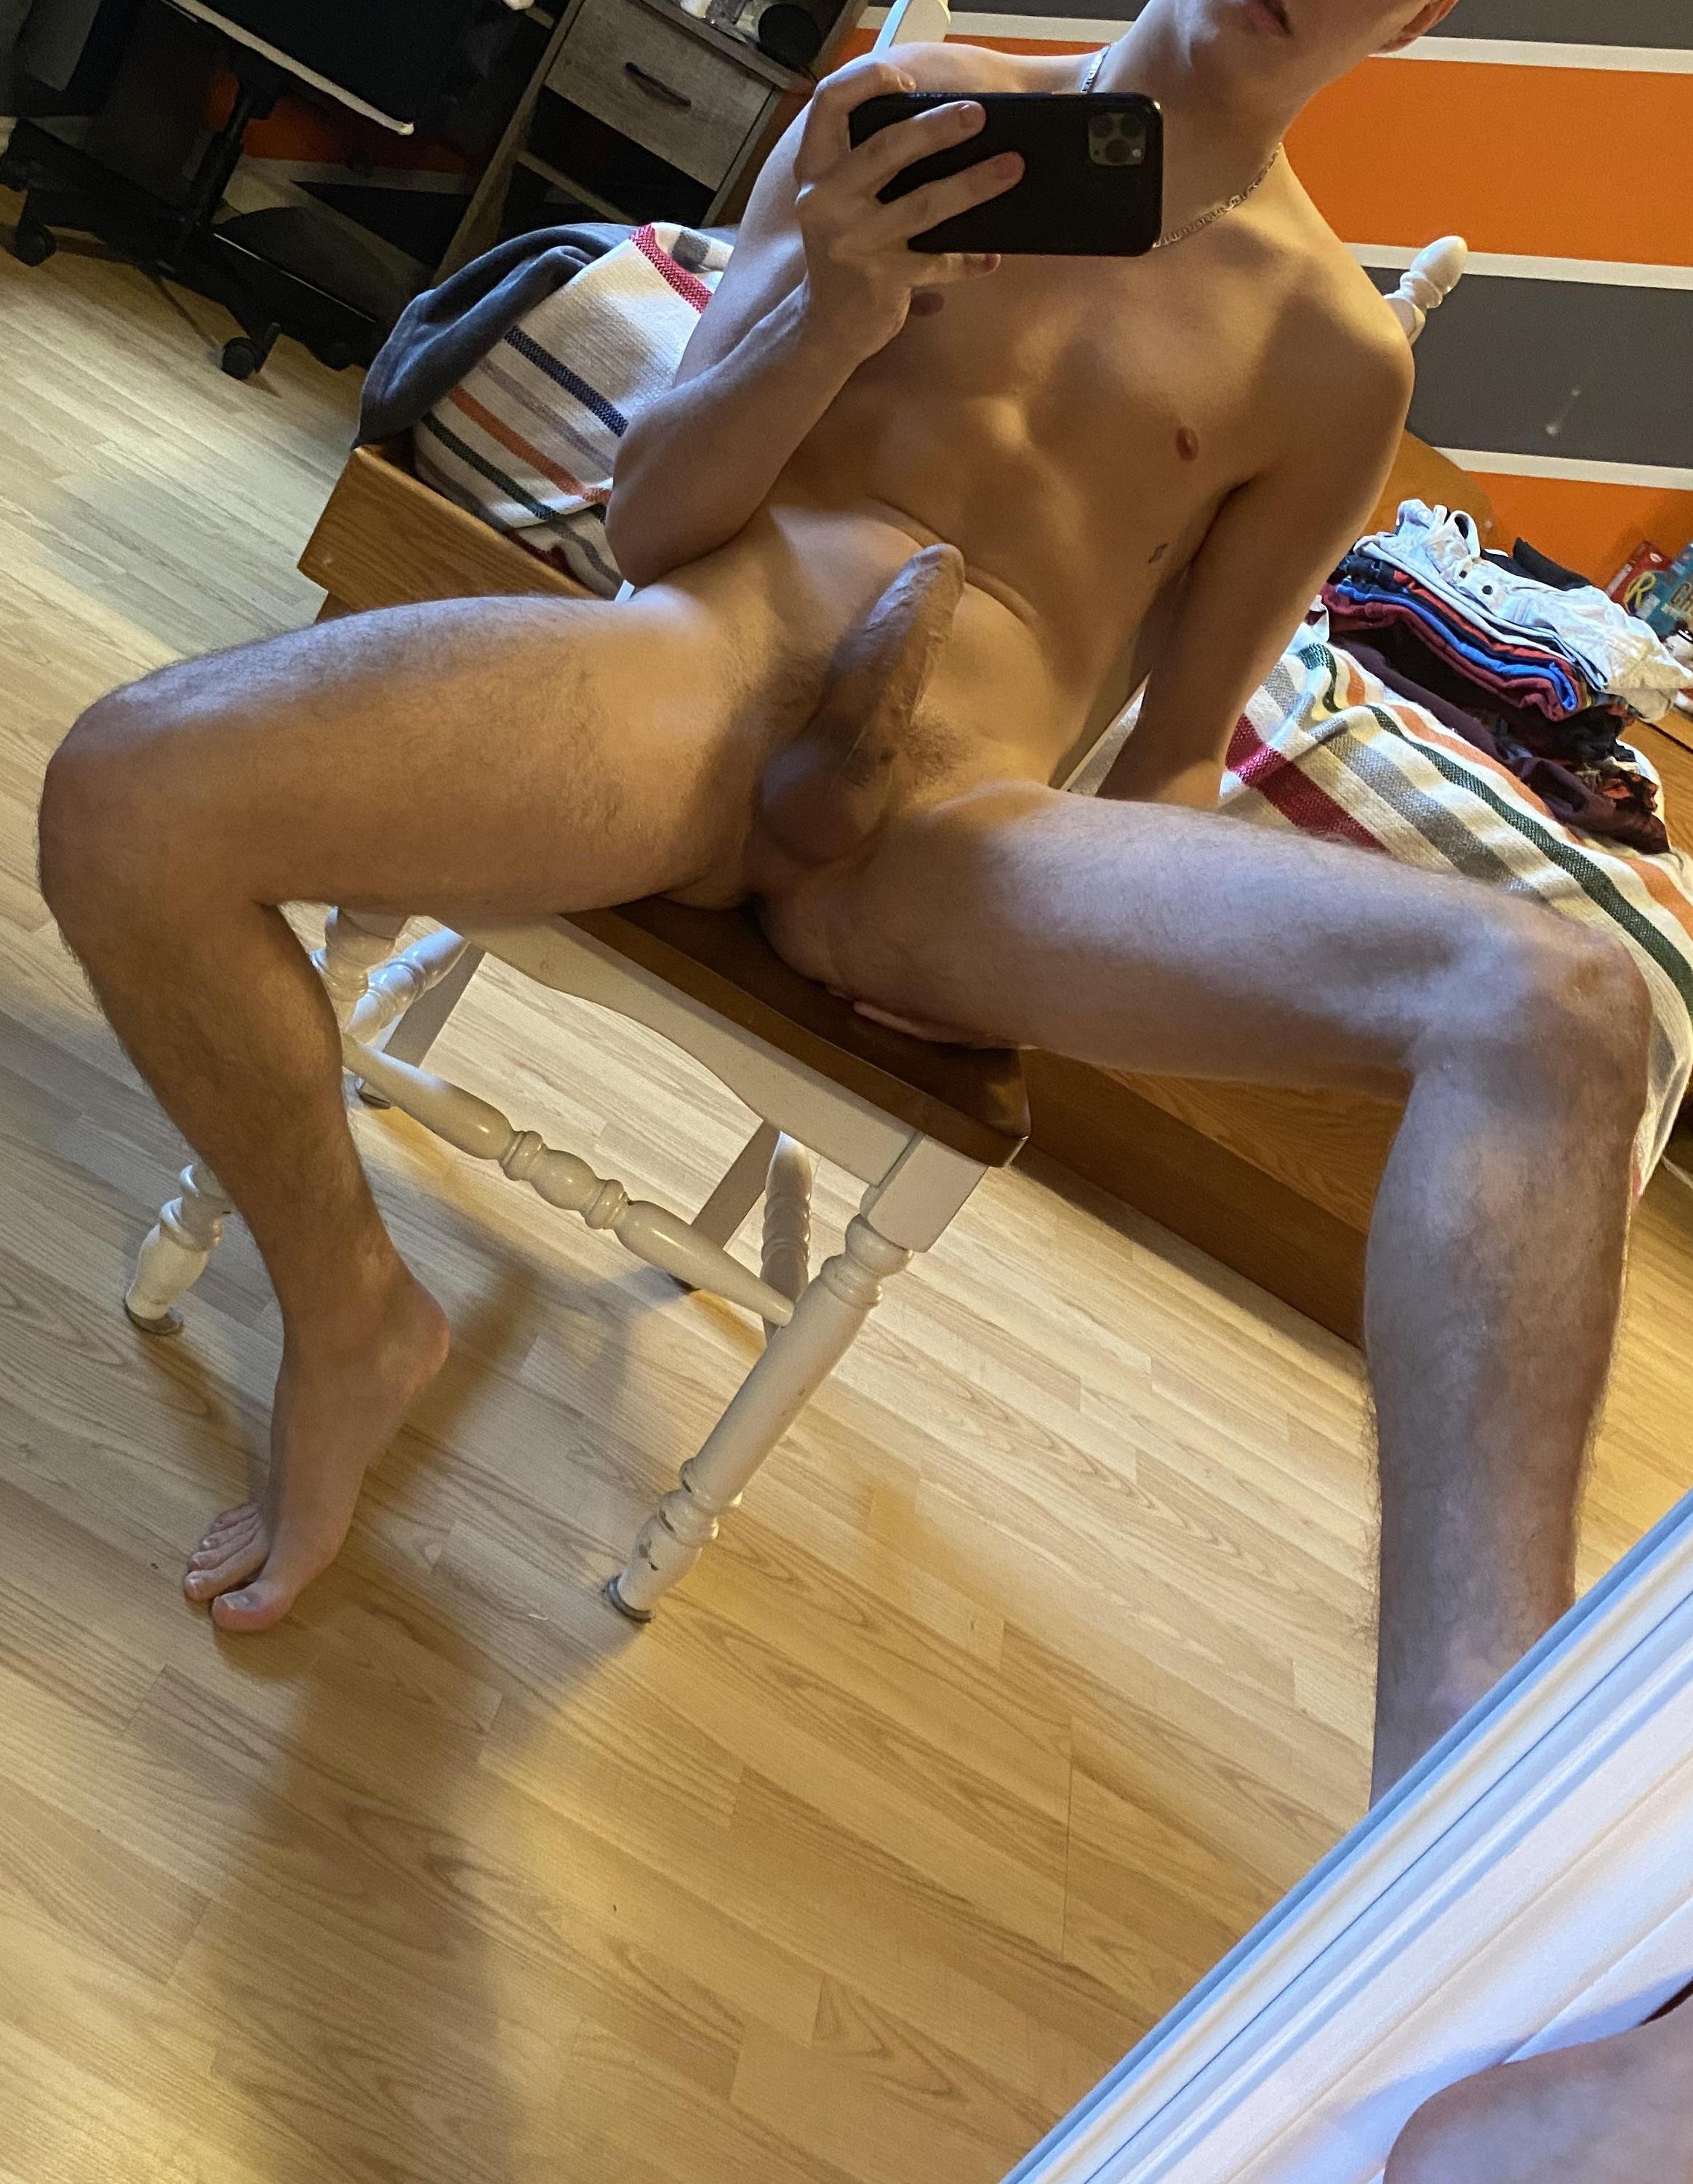 Nude mirror self picture